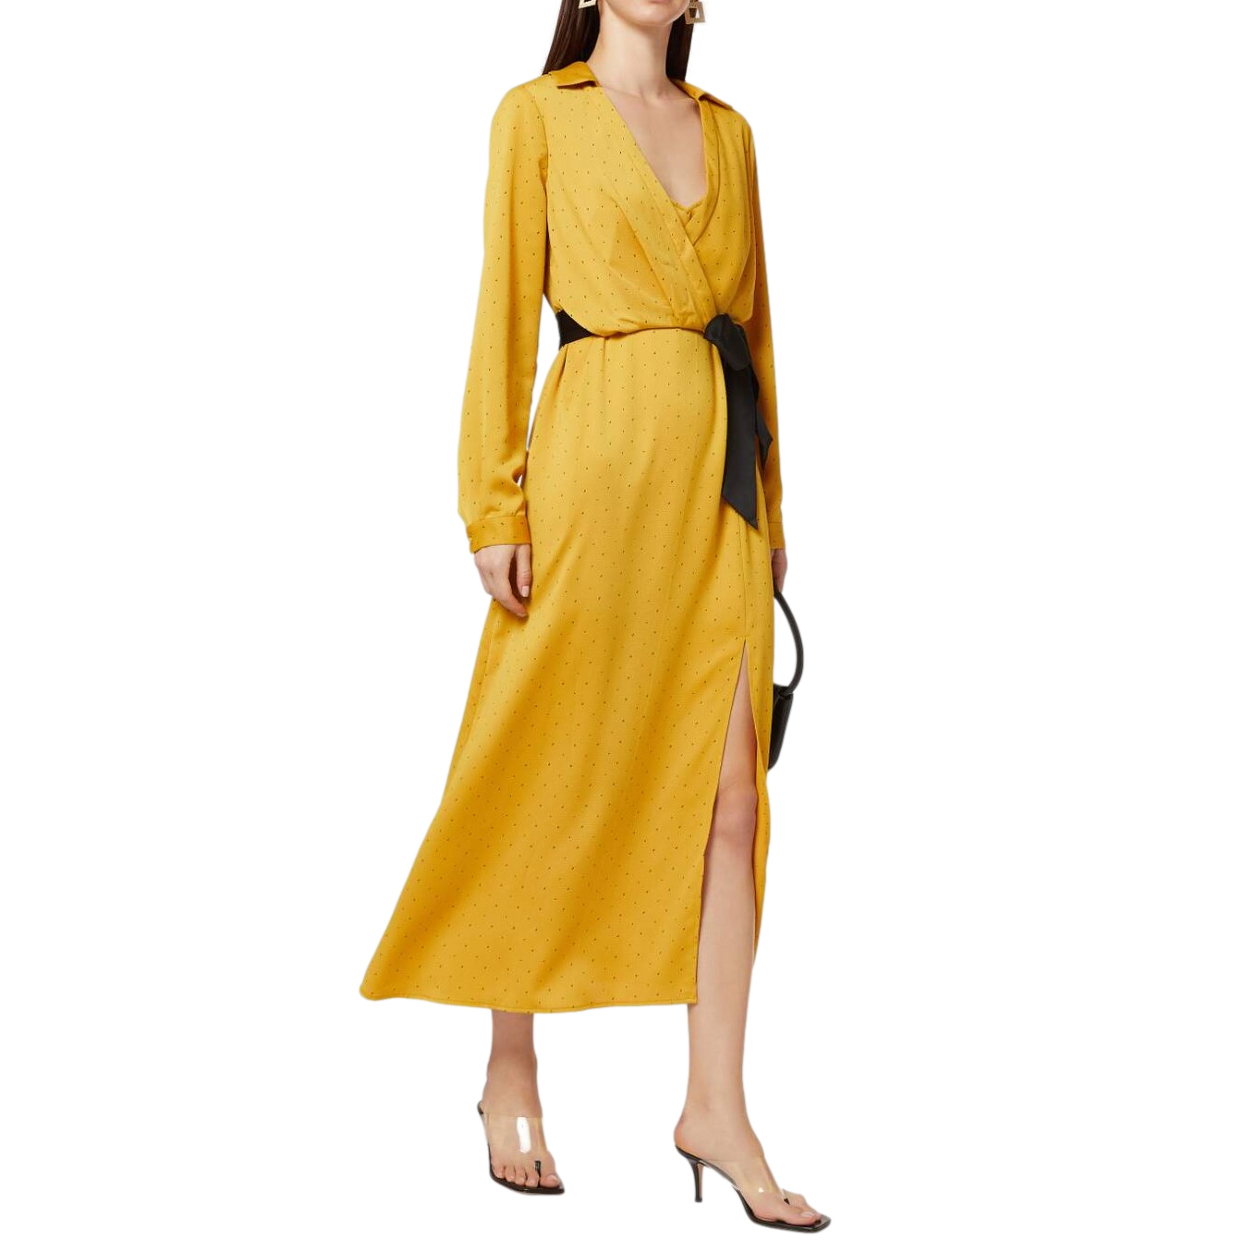 BCBG Max Azria Yellow Satin Spotted Midi Dress